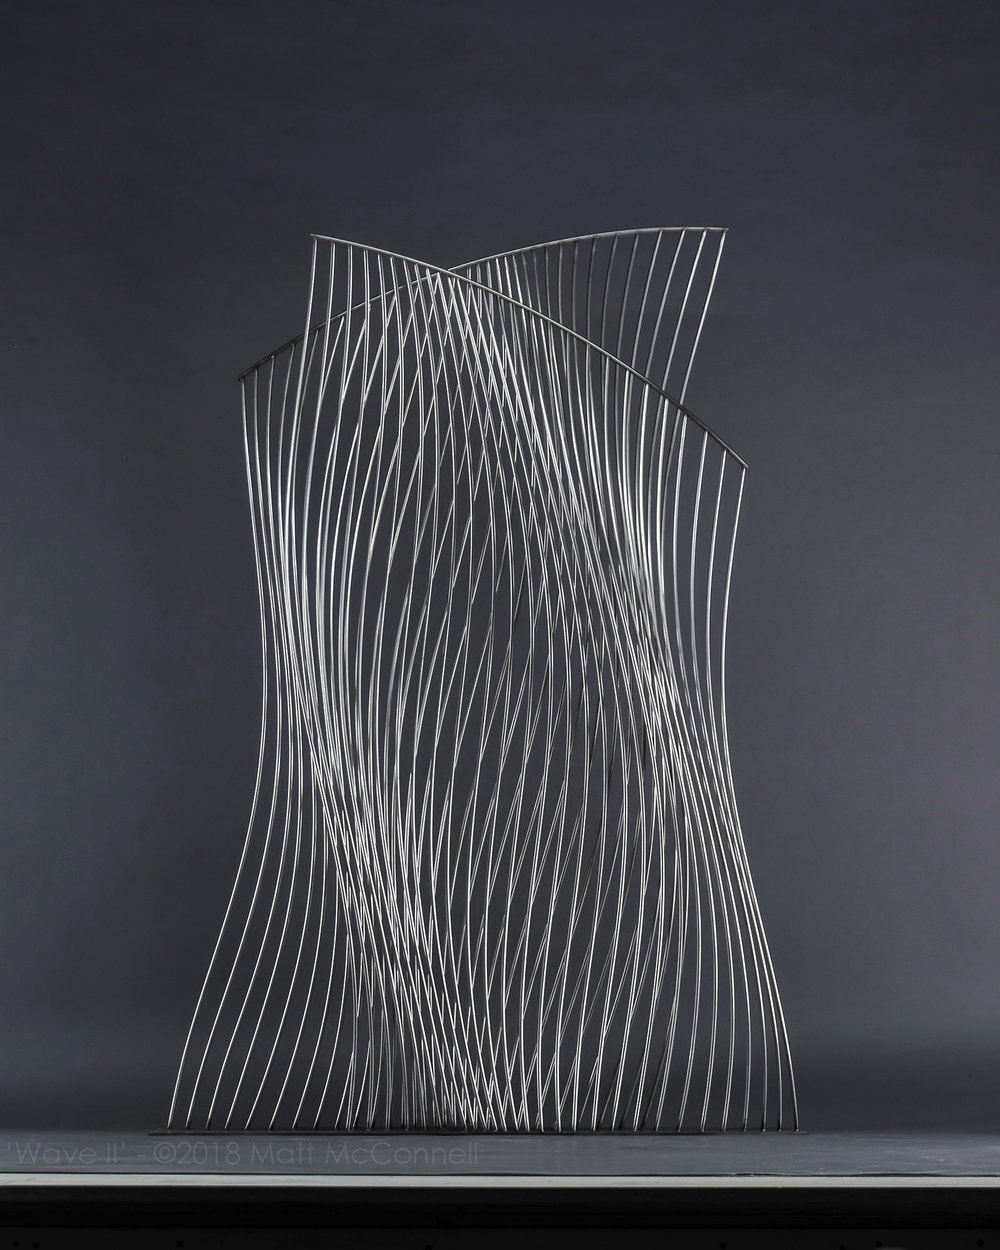 'Wave II'-©2018 Matt McConnell-2.jpg